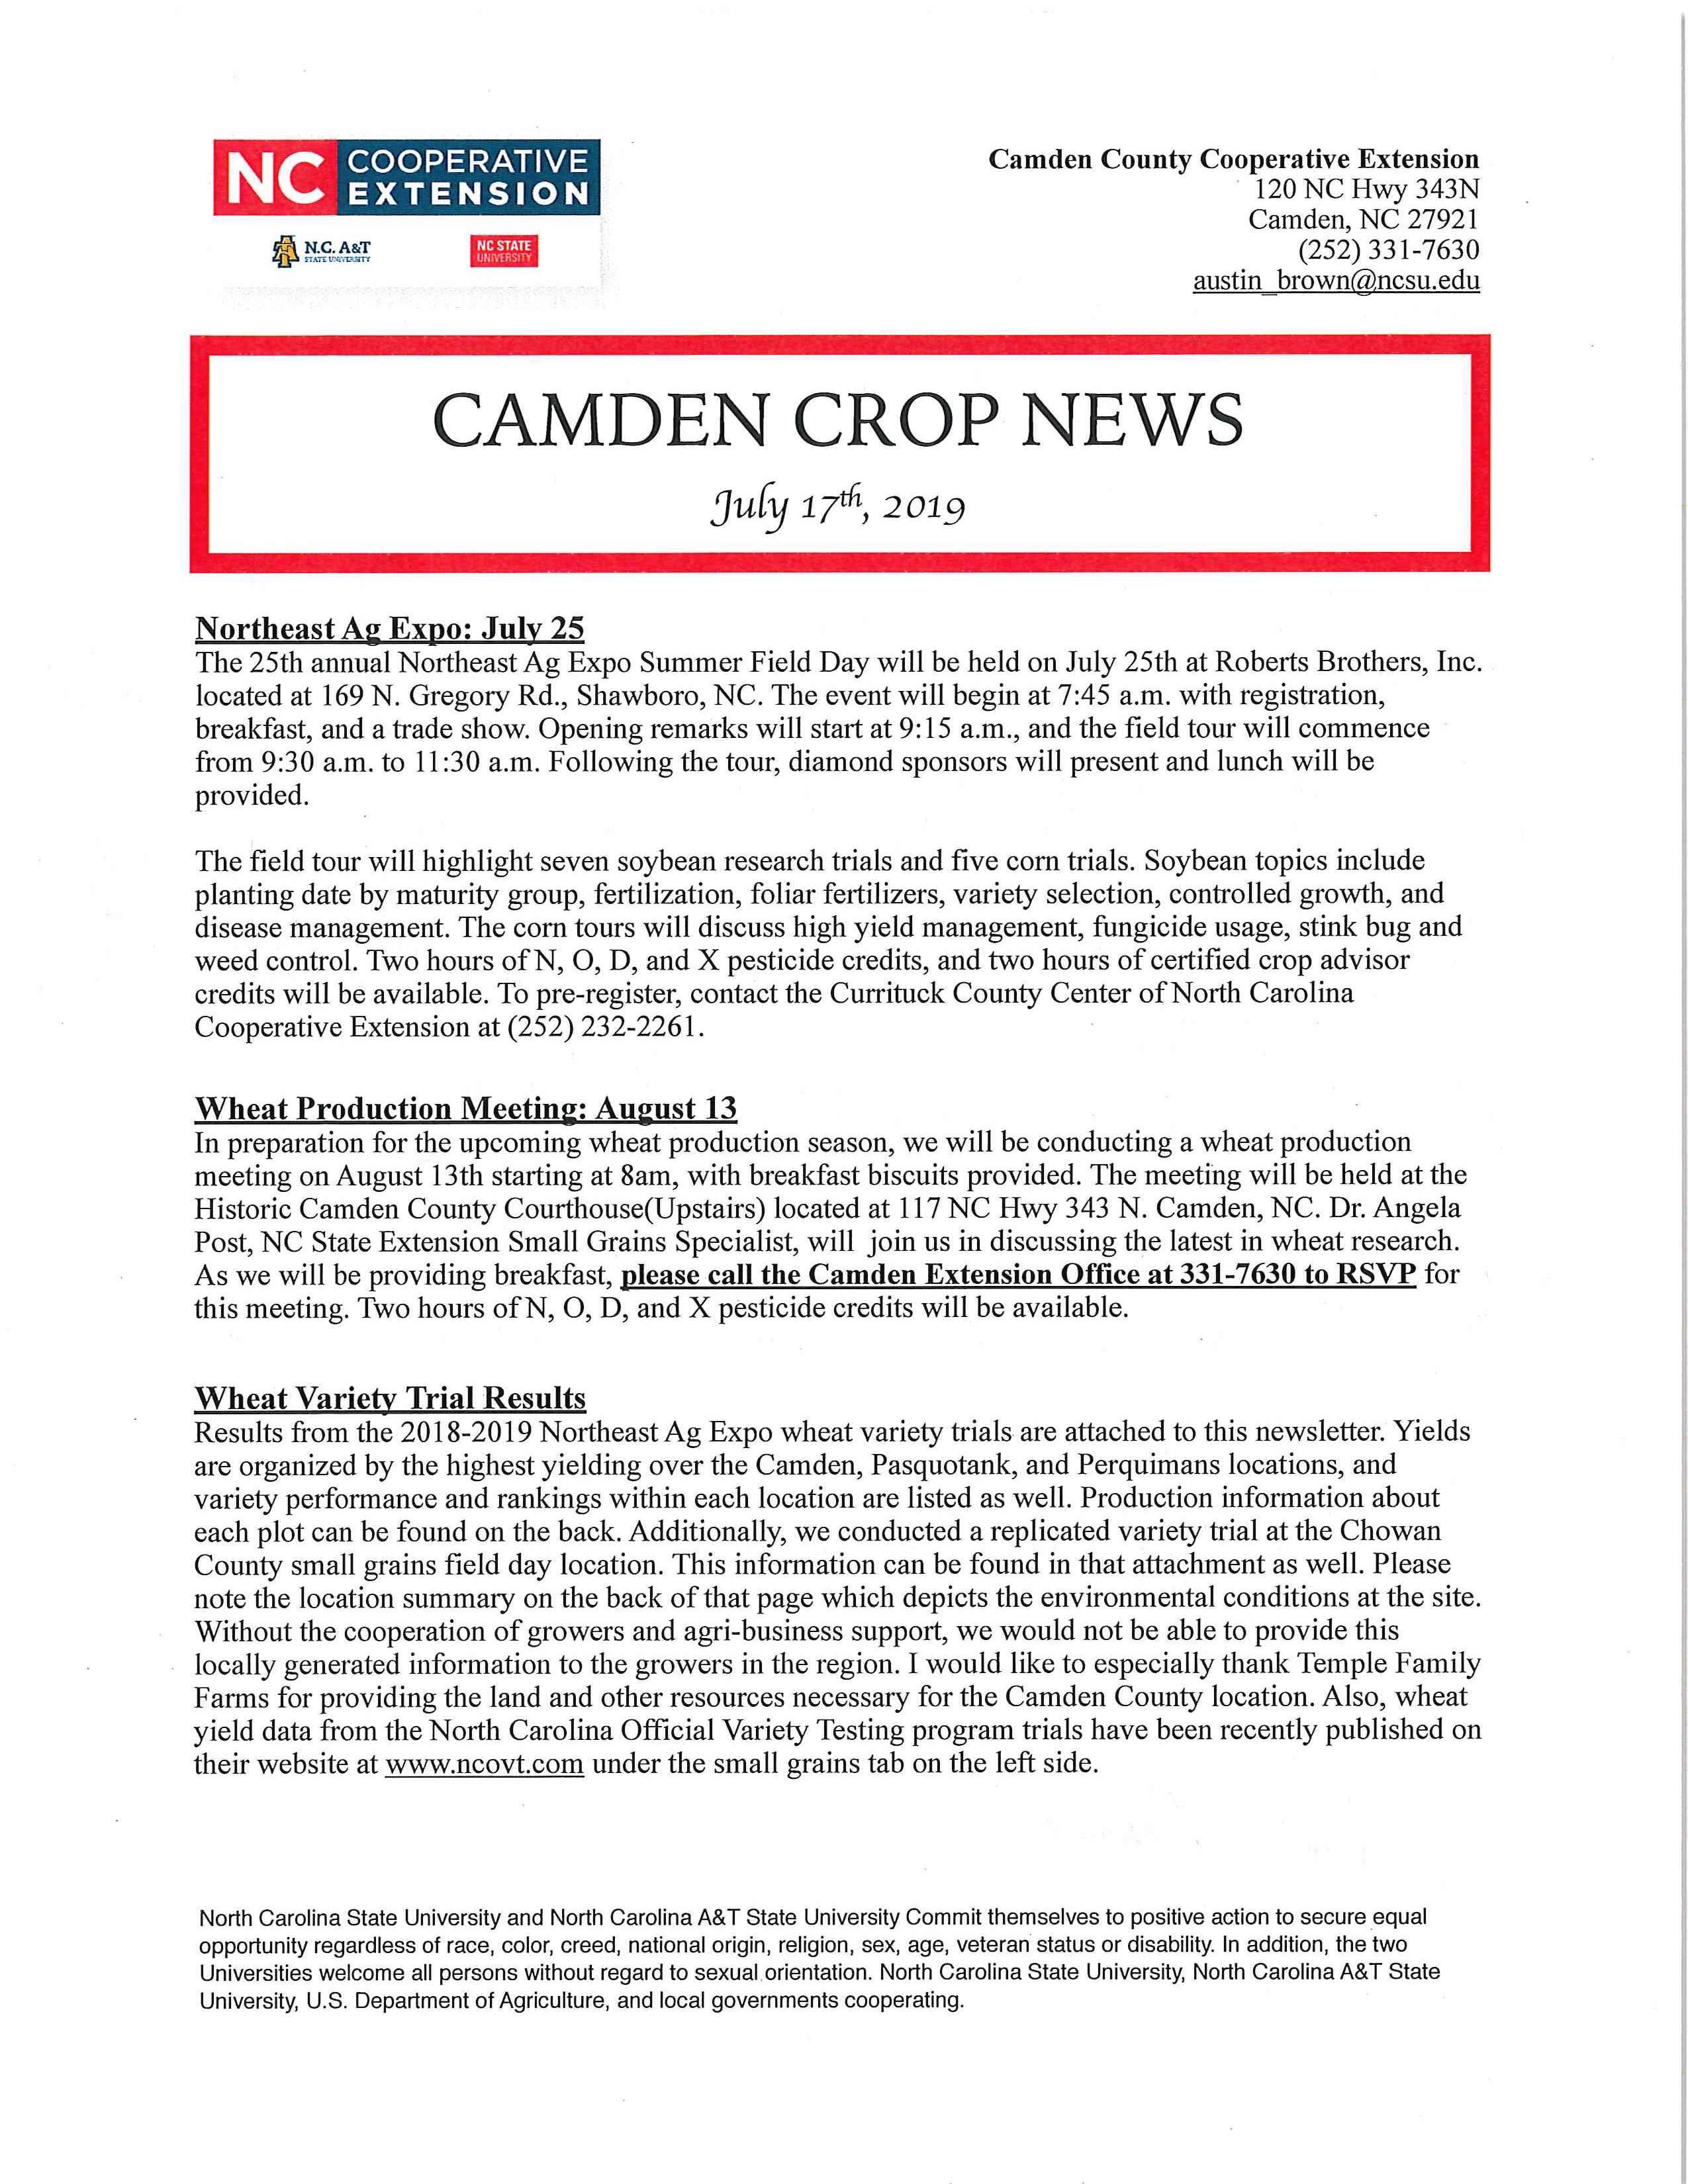 Crop News page